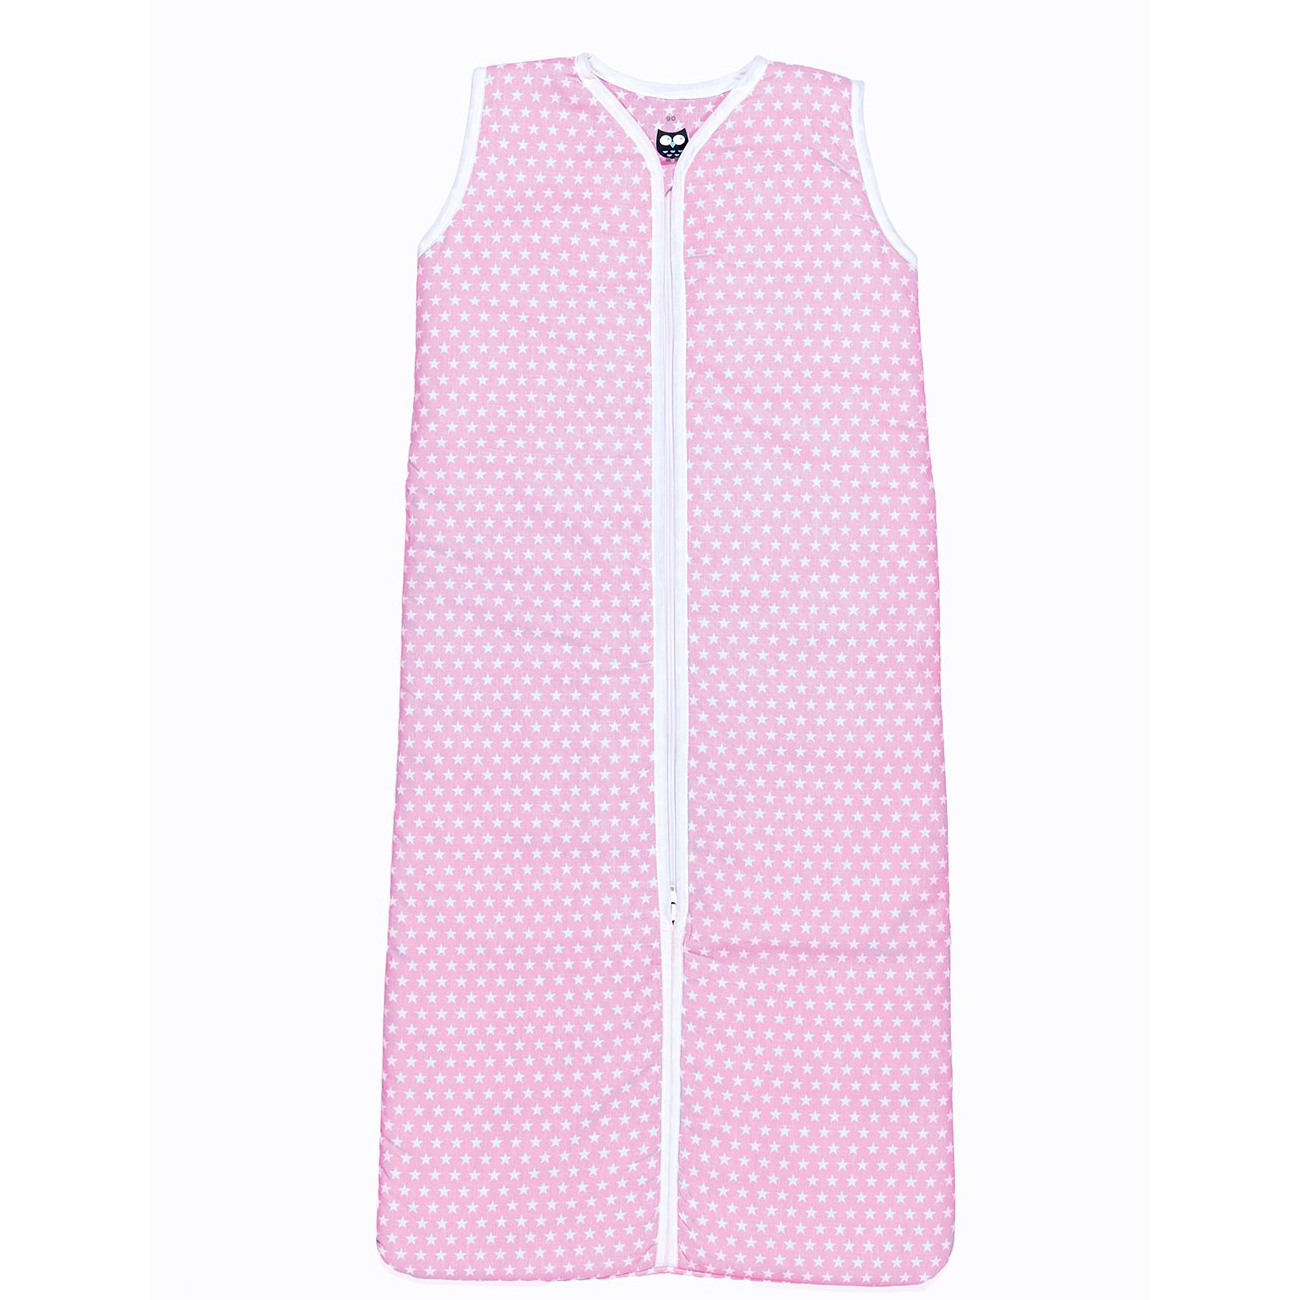 Sommerschlafsack Rosa 70cm - Briljant Baby